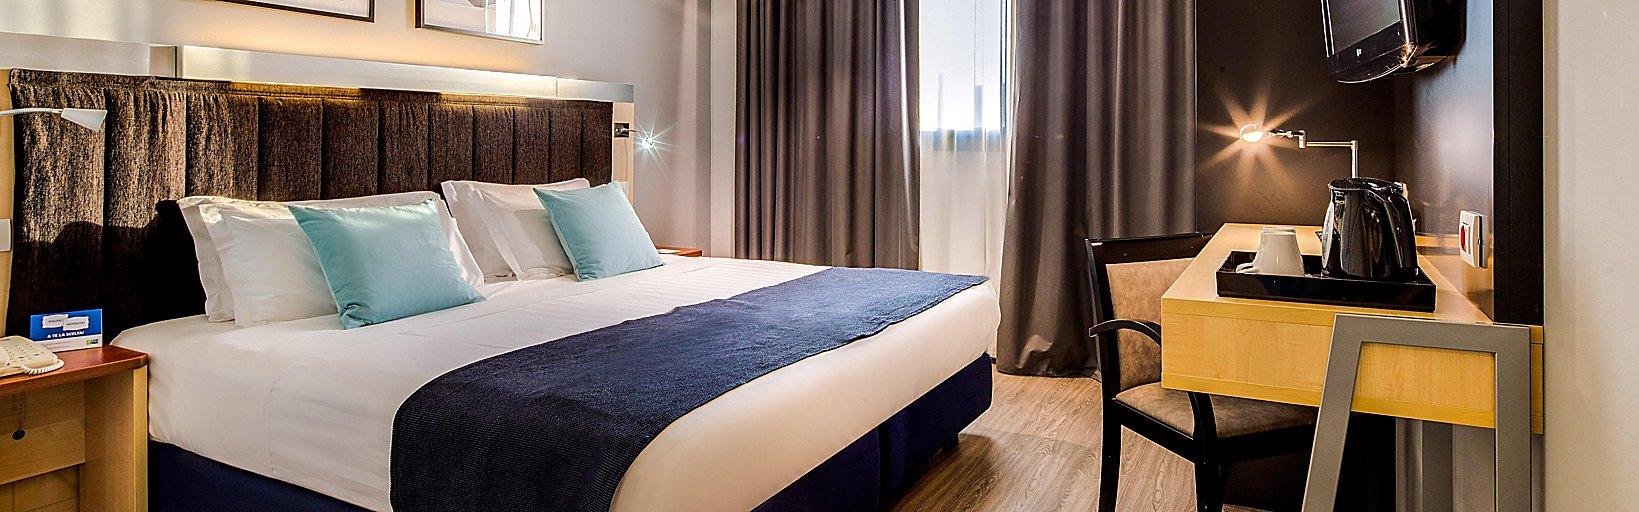 Letto Matrimoniale A Bologna.Holiday Inn Bologna Hotels Holiday Inn Express Bologna Fiera